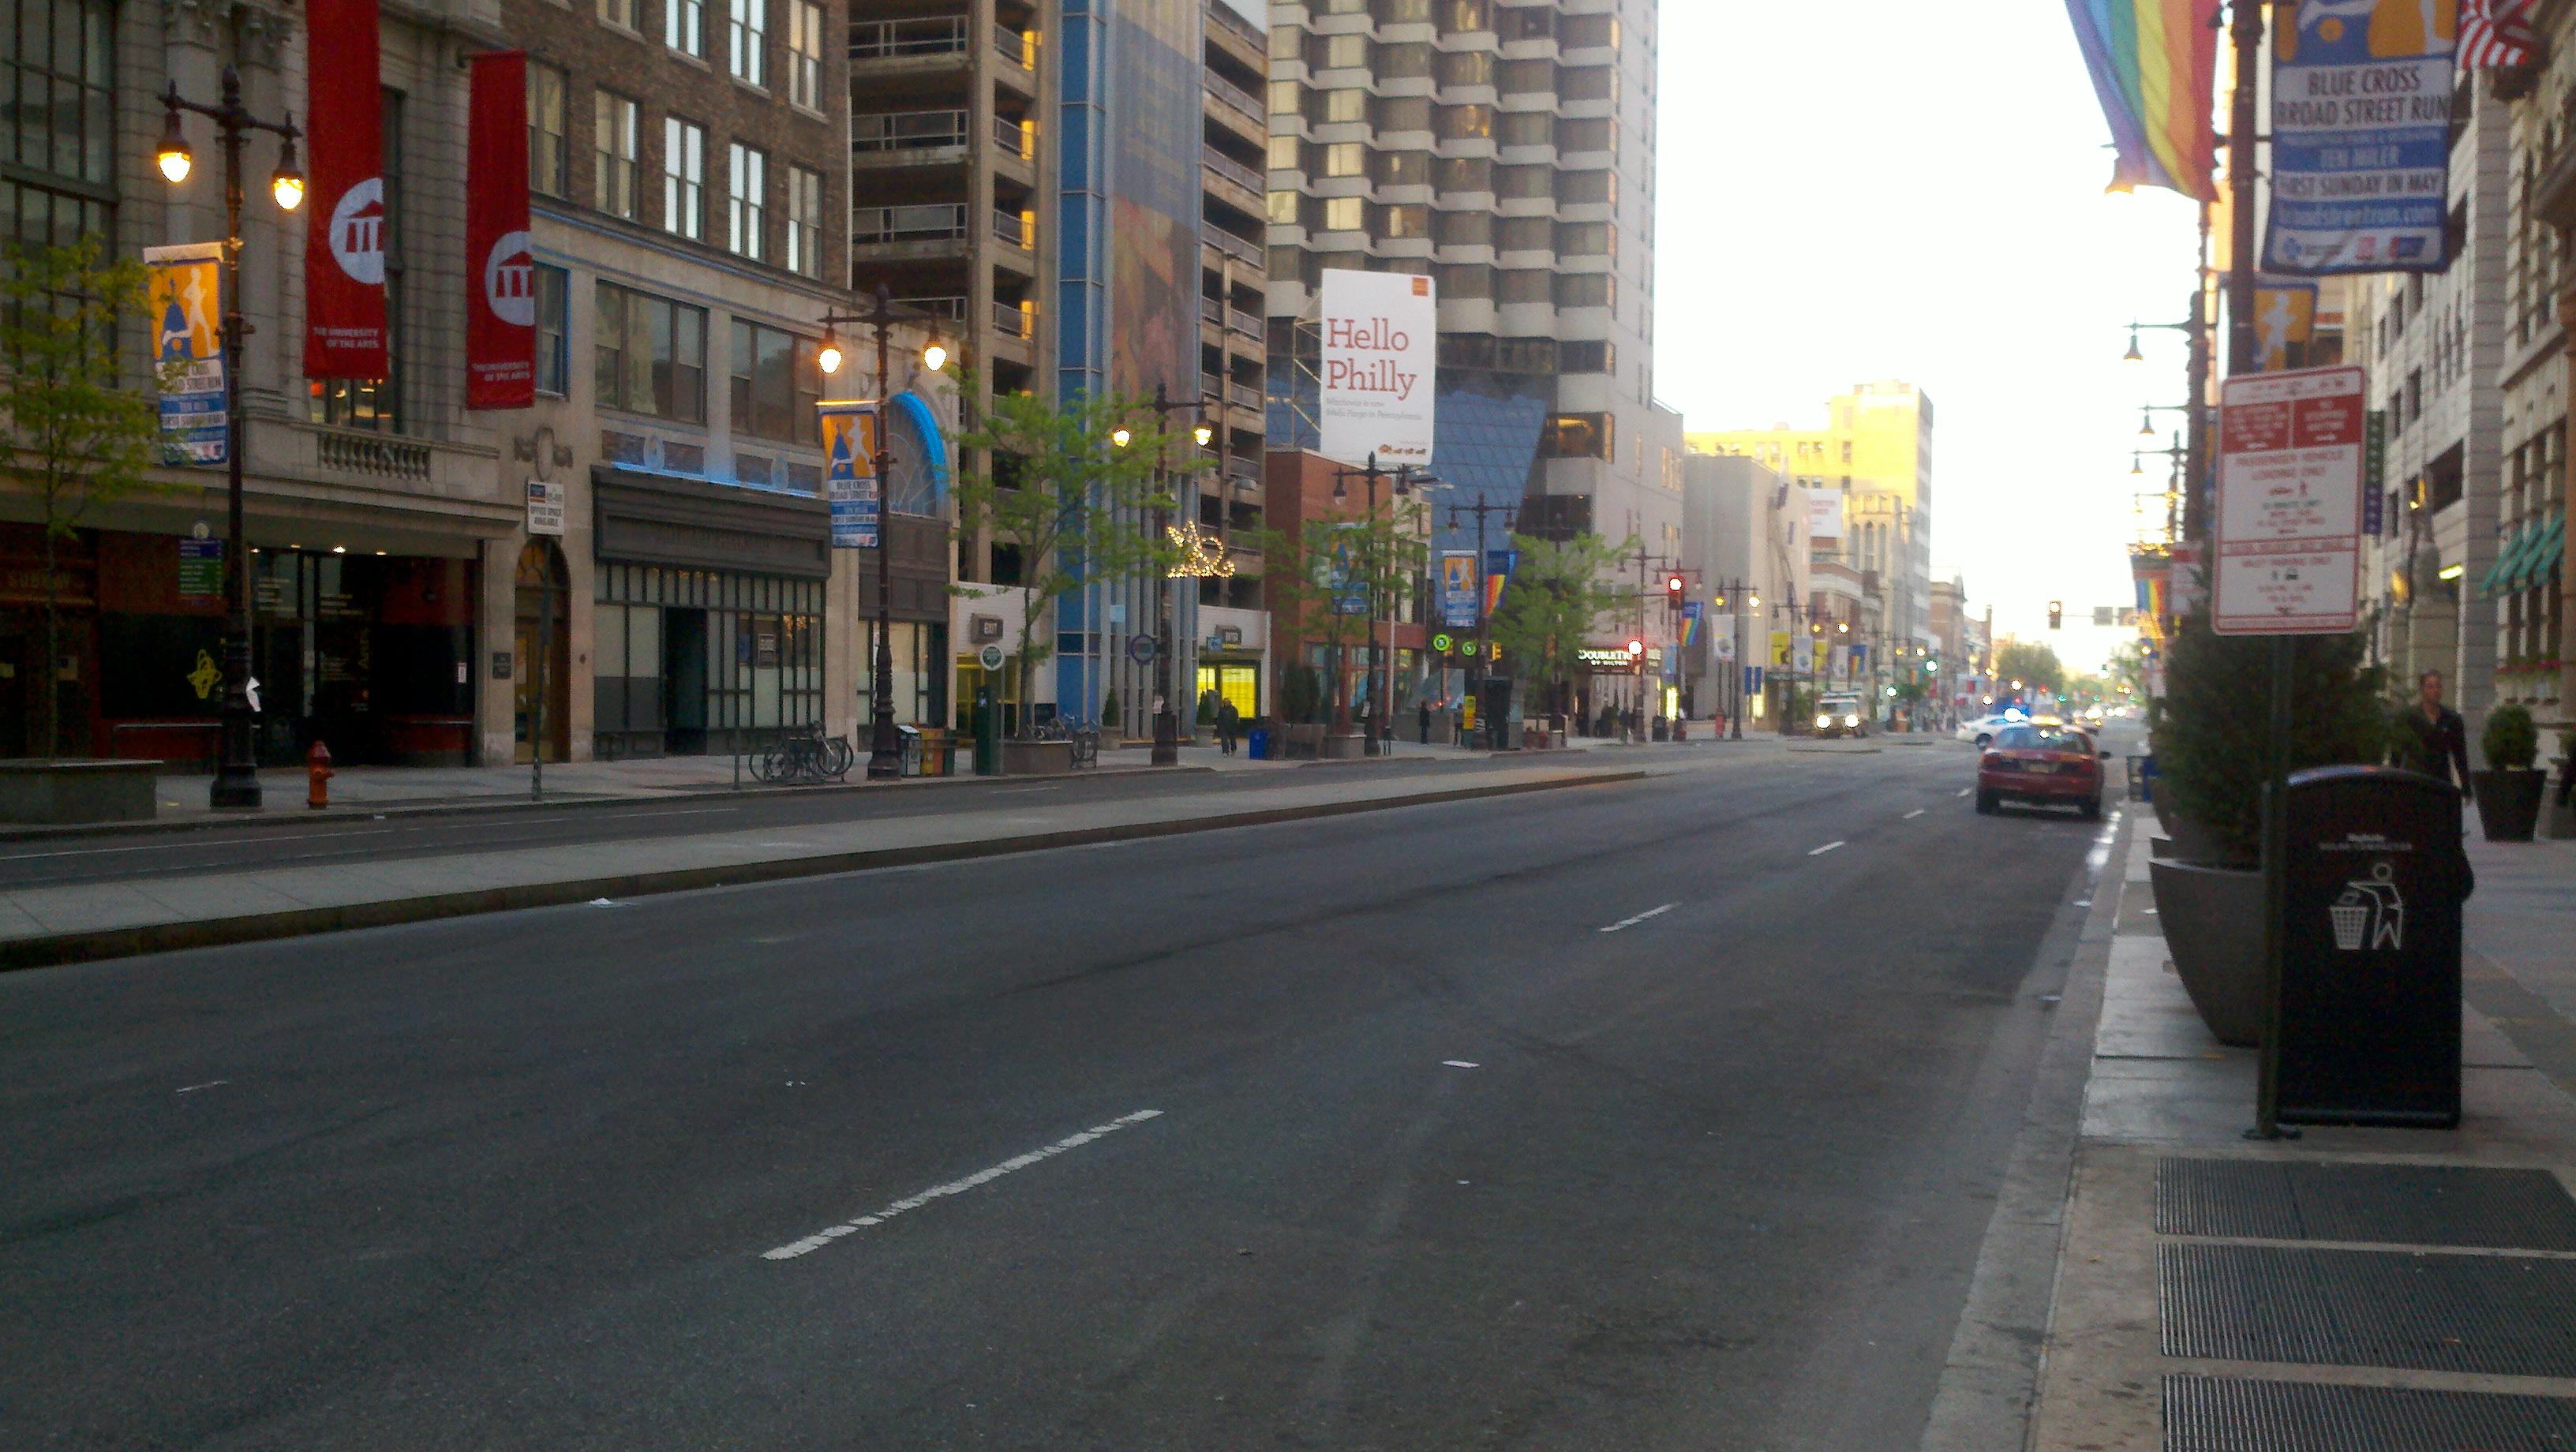 On street sex pic 95